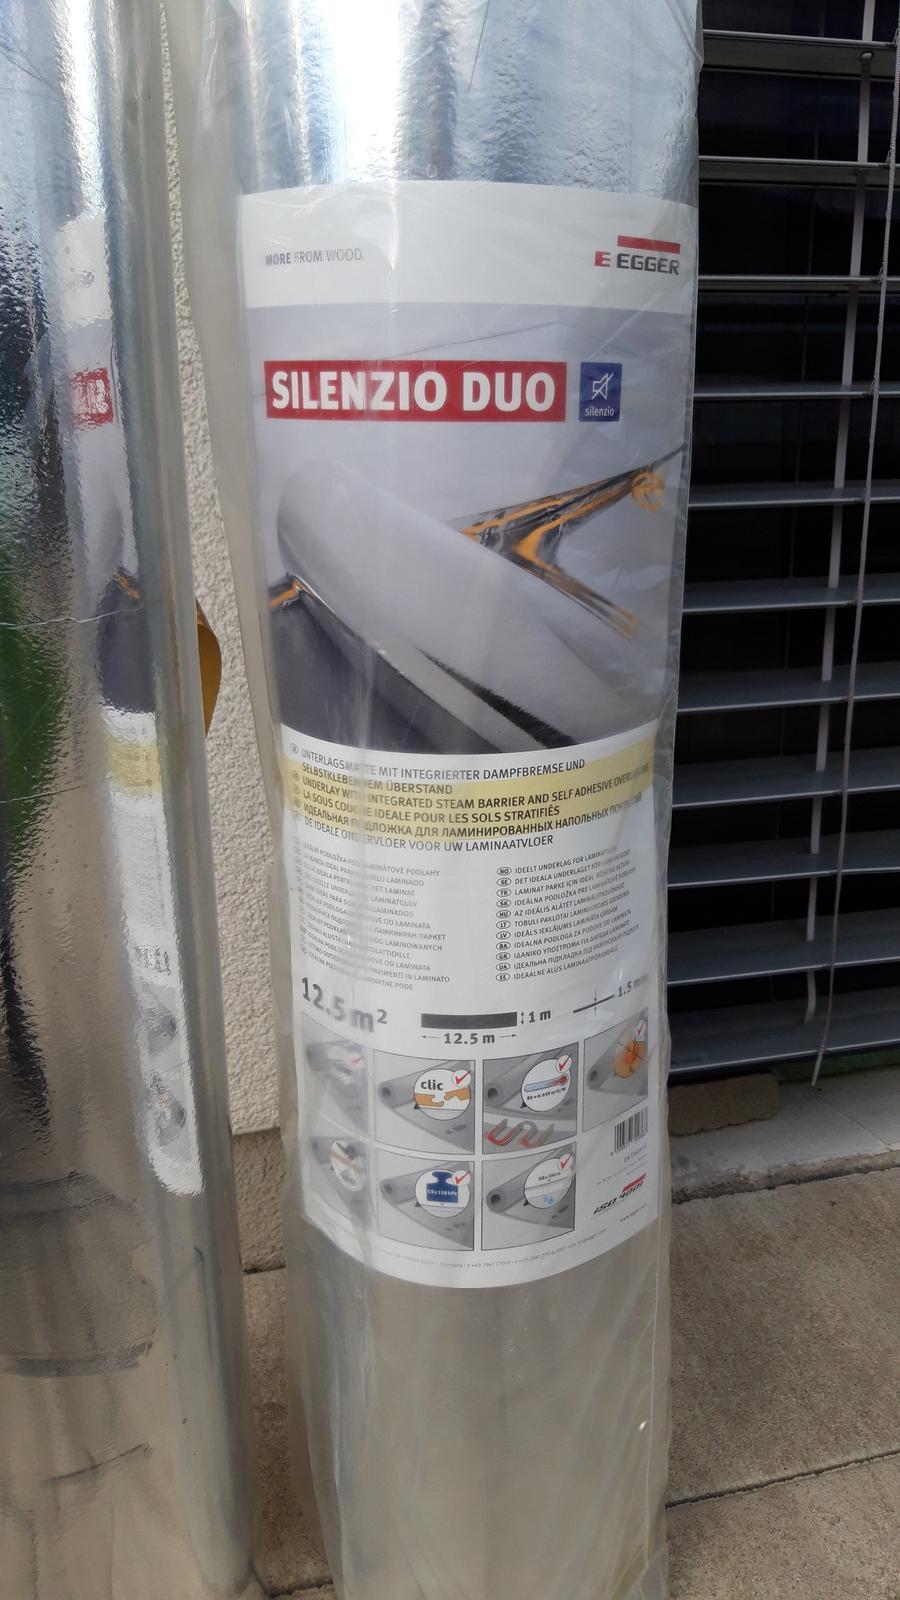 Podložka pod laminátovú podlahu Egger Silenzio Duo - Obrázok č. 1